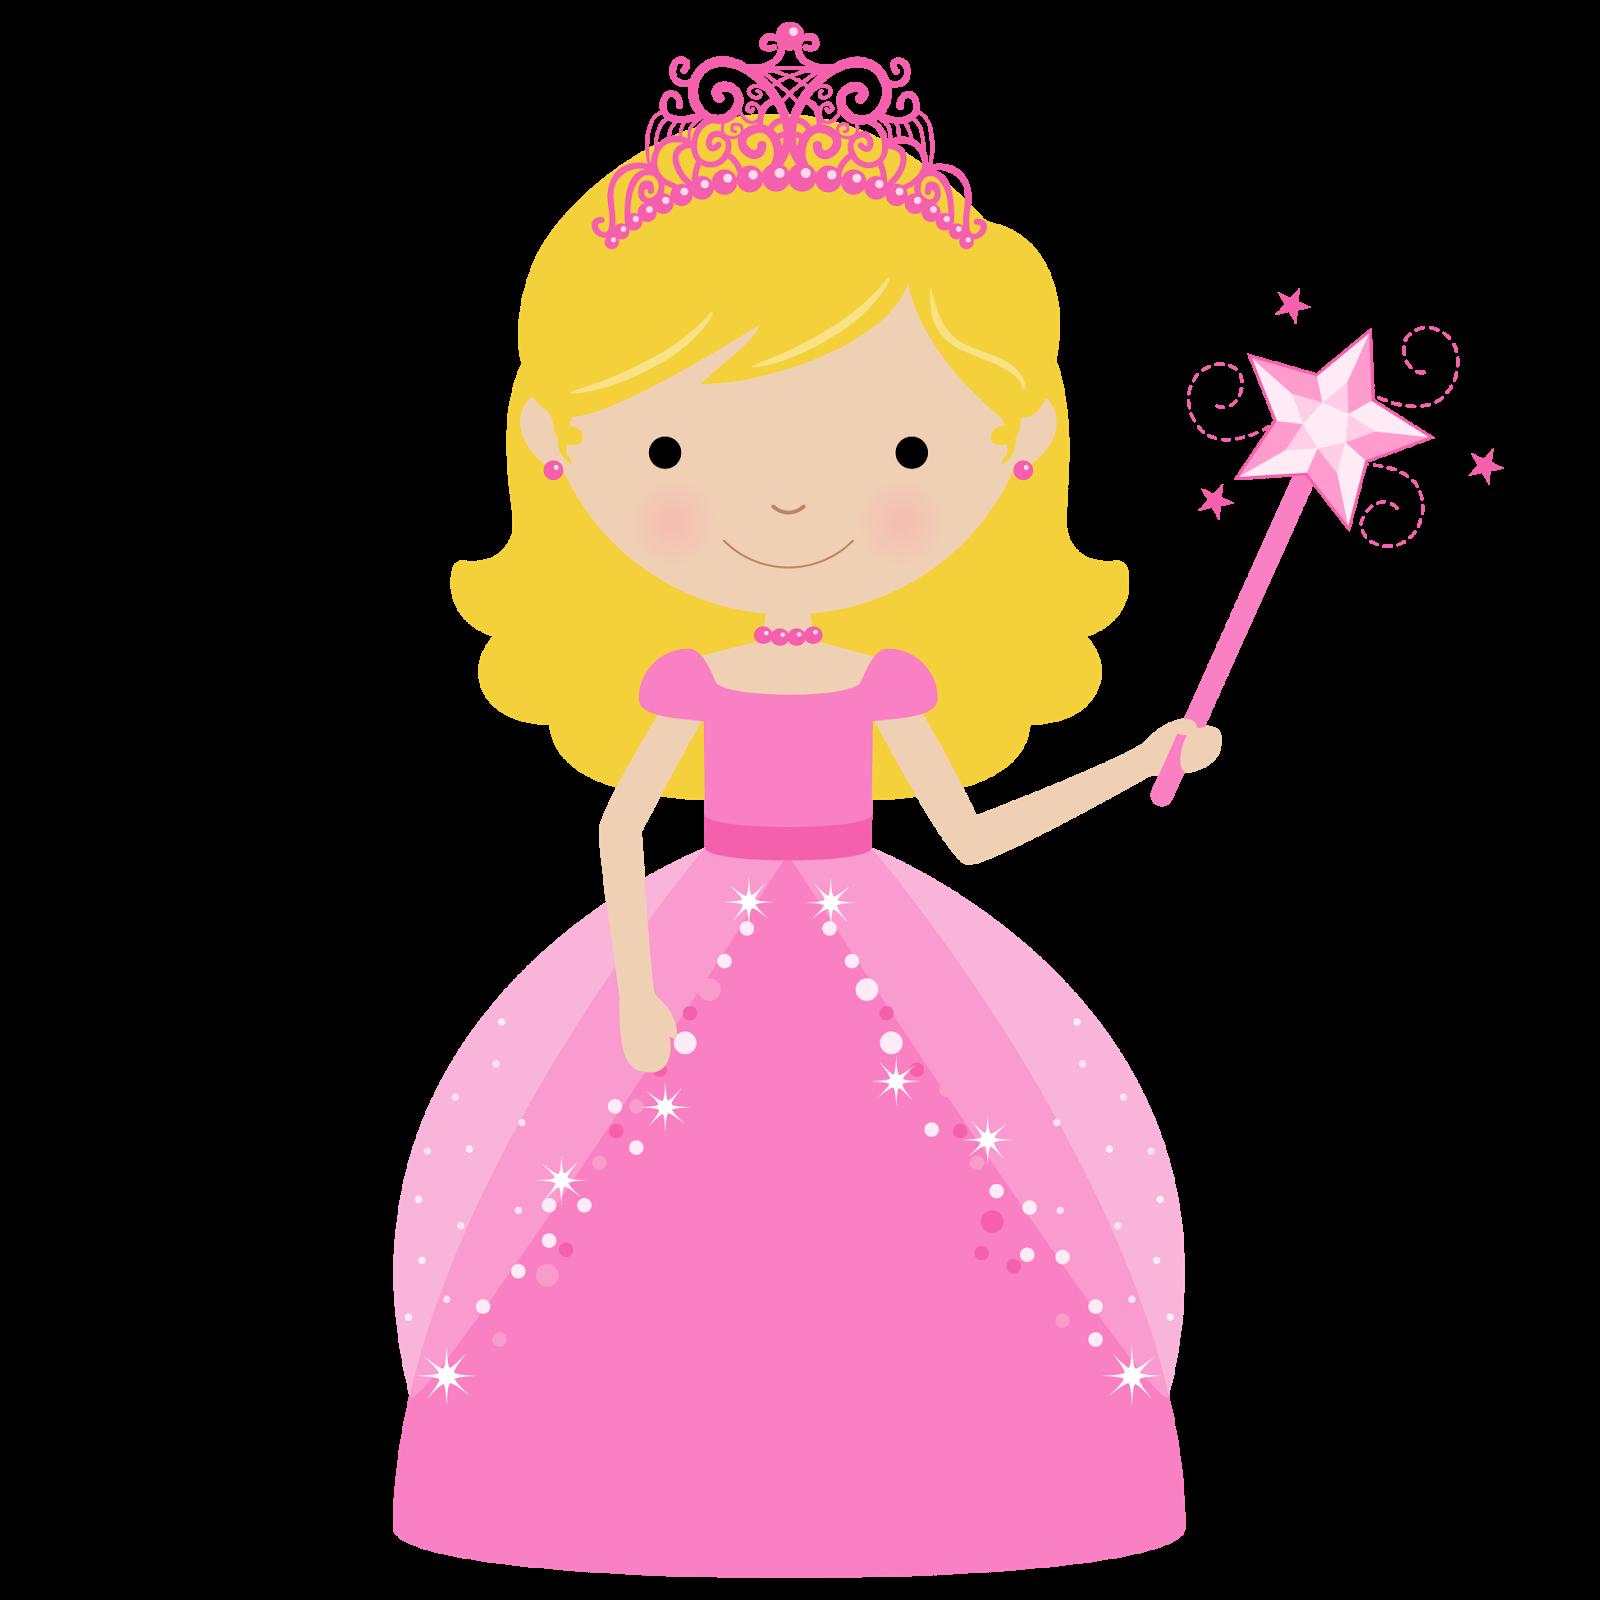 Fairytale clipart princess birthday. Iq szpee t png